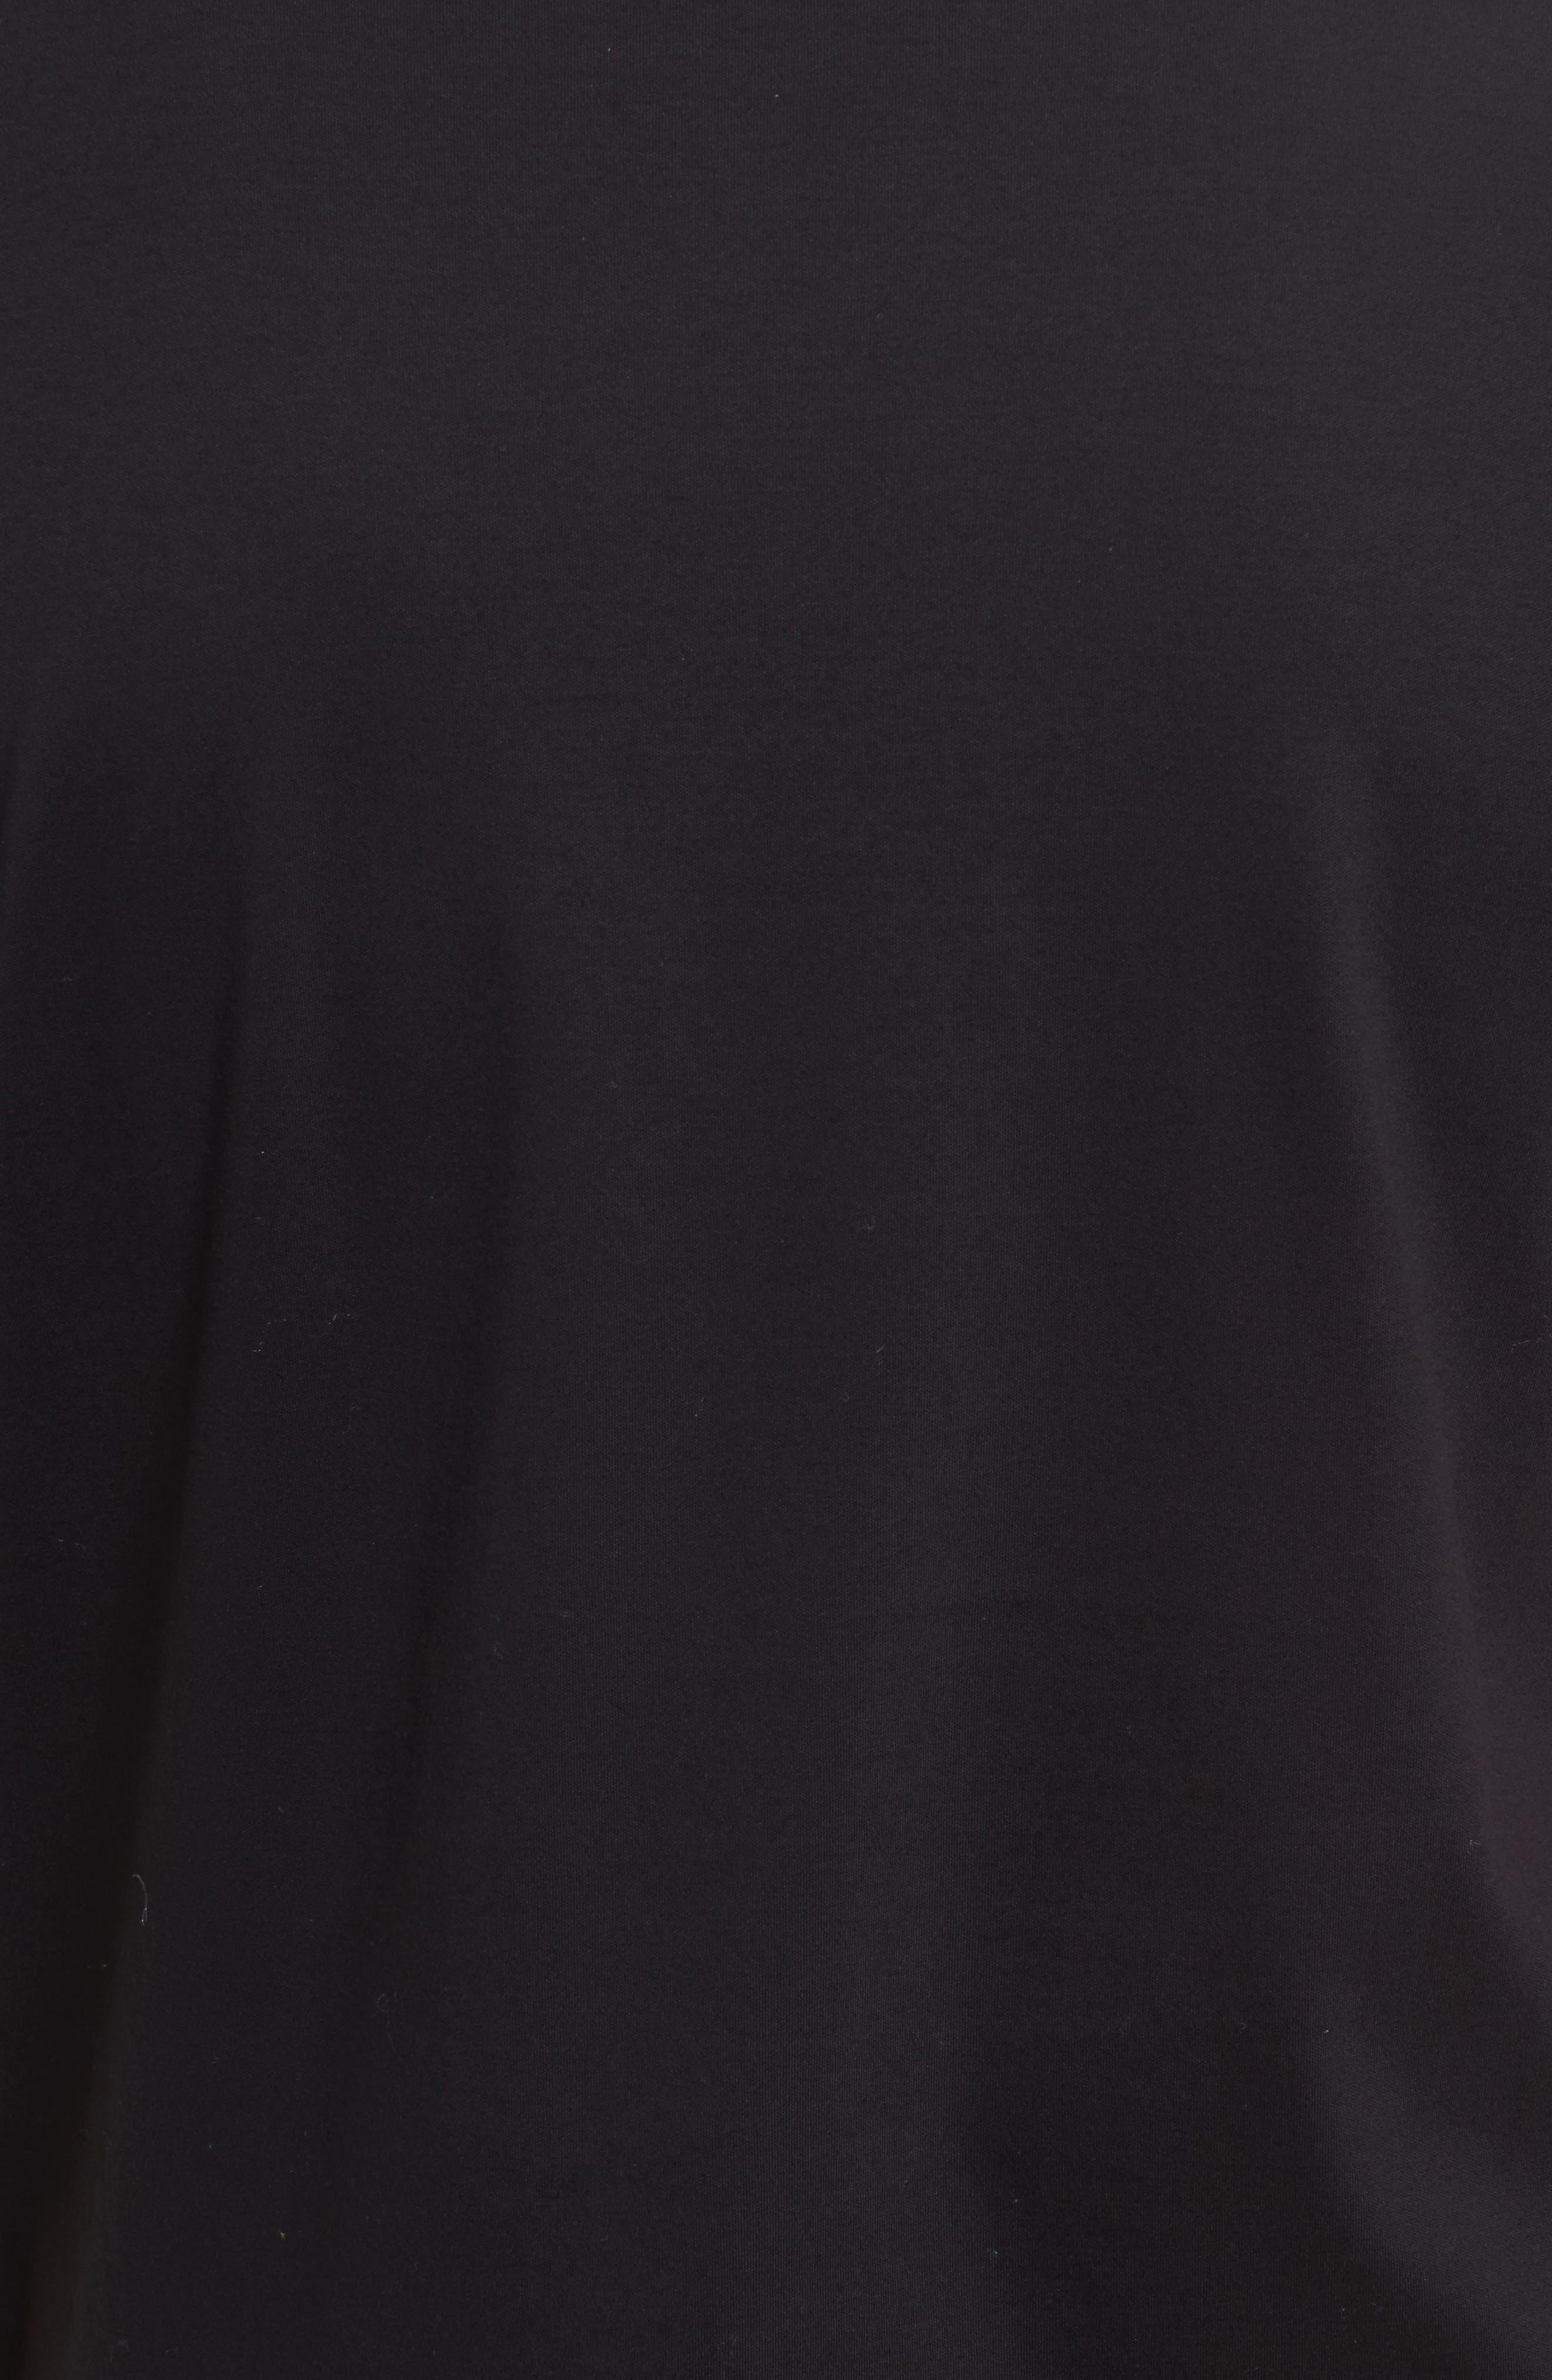 Tessler Mercedes Slim Fit Crewneck T-Shirt,                             Alternate thumbnail 5, color,                             Black